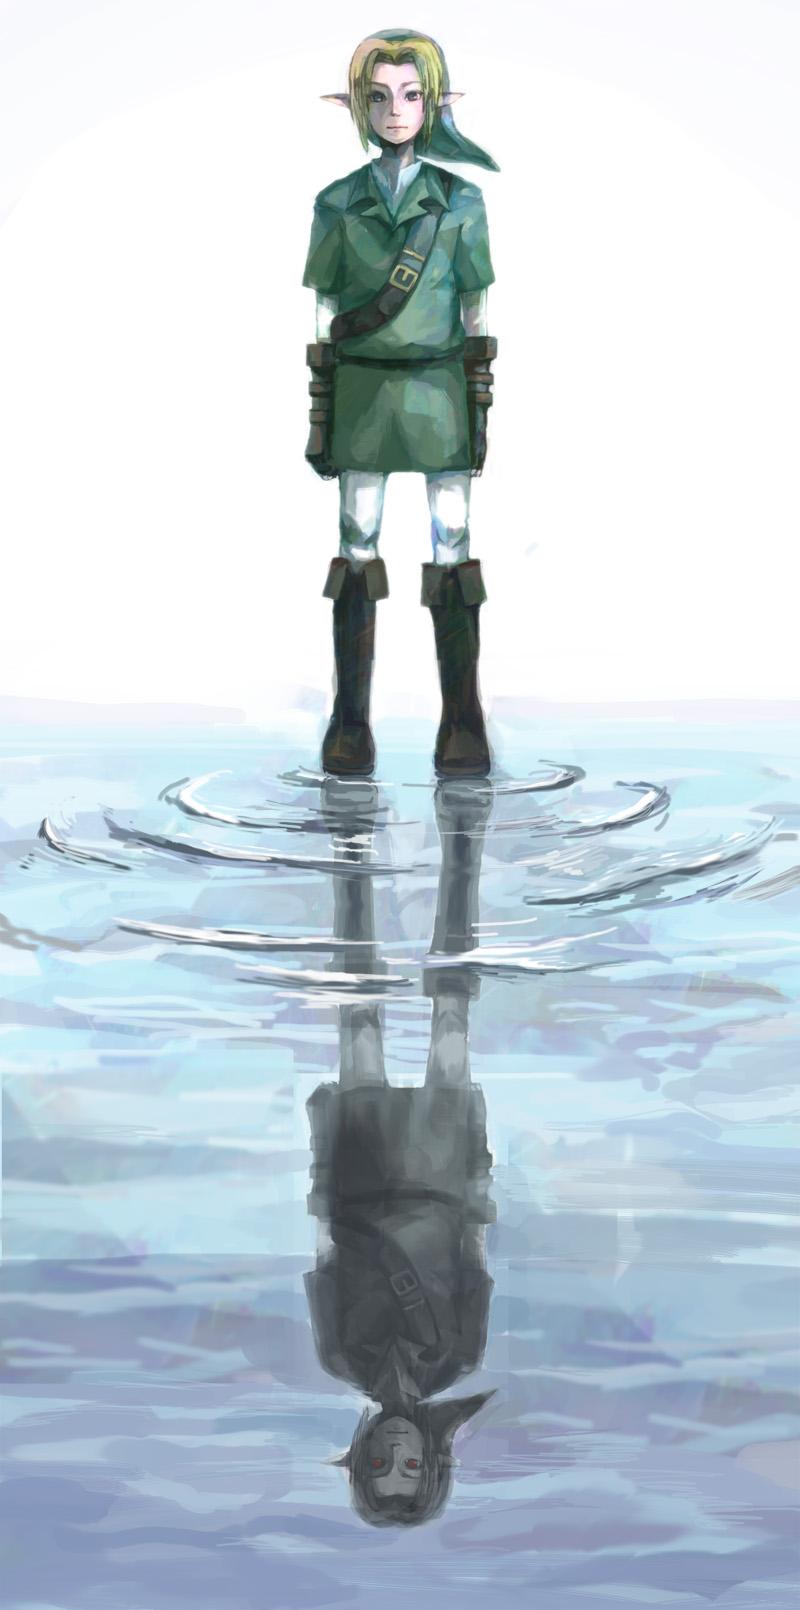 Ocarina of Time Image #1033294 - Zerochan Anime Image Board